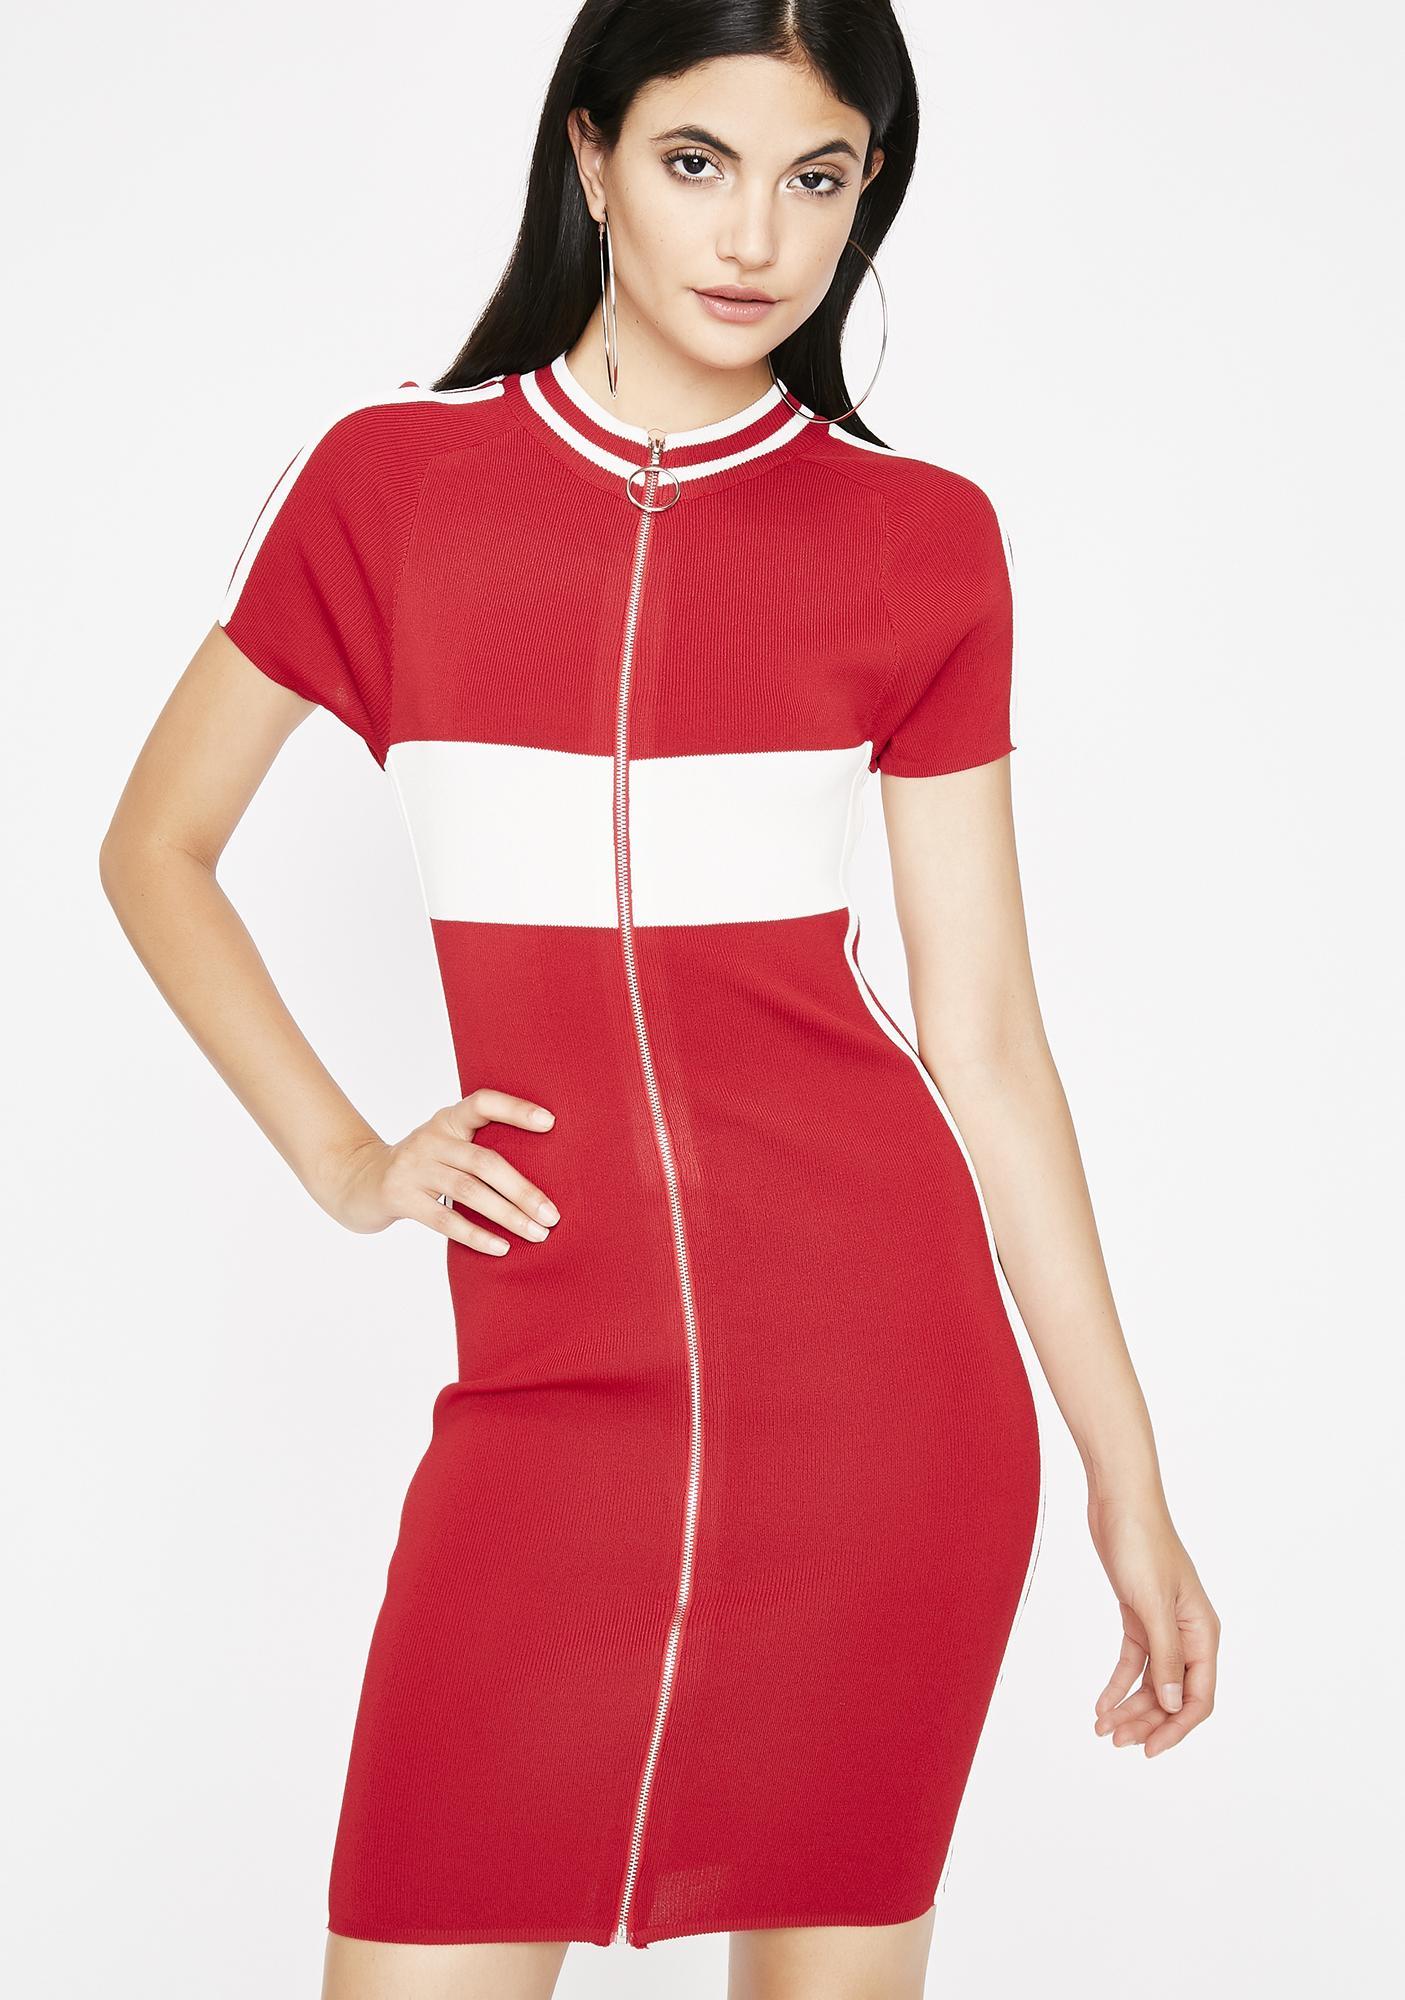 Sporty Formal Dresses